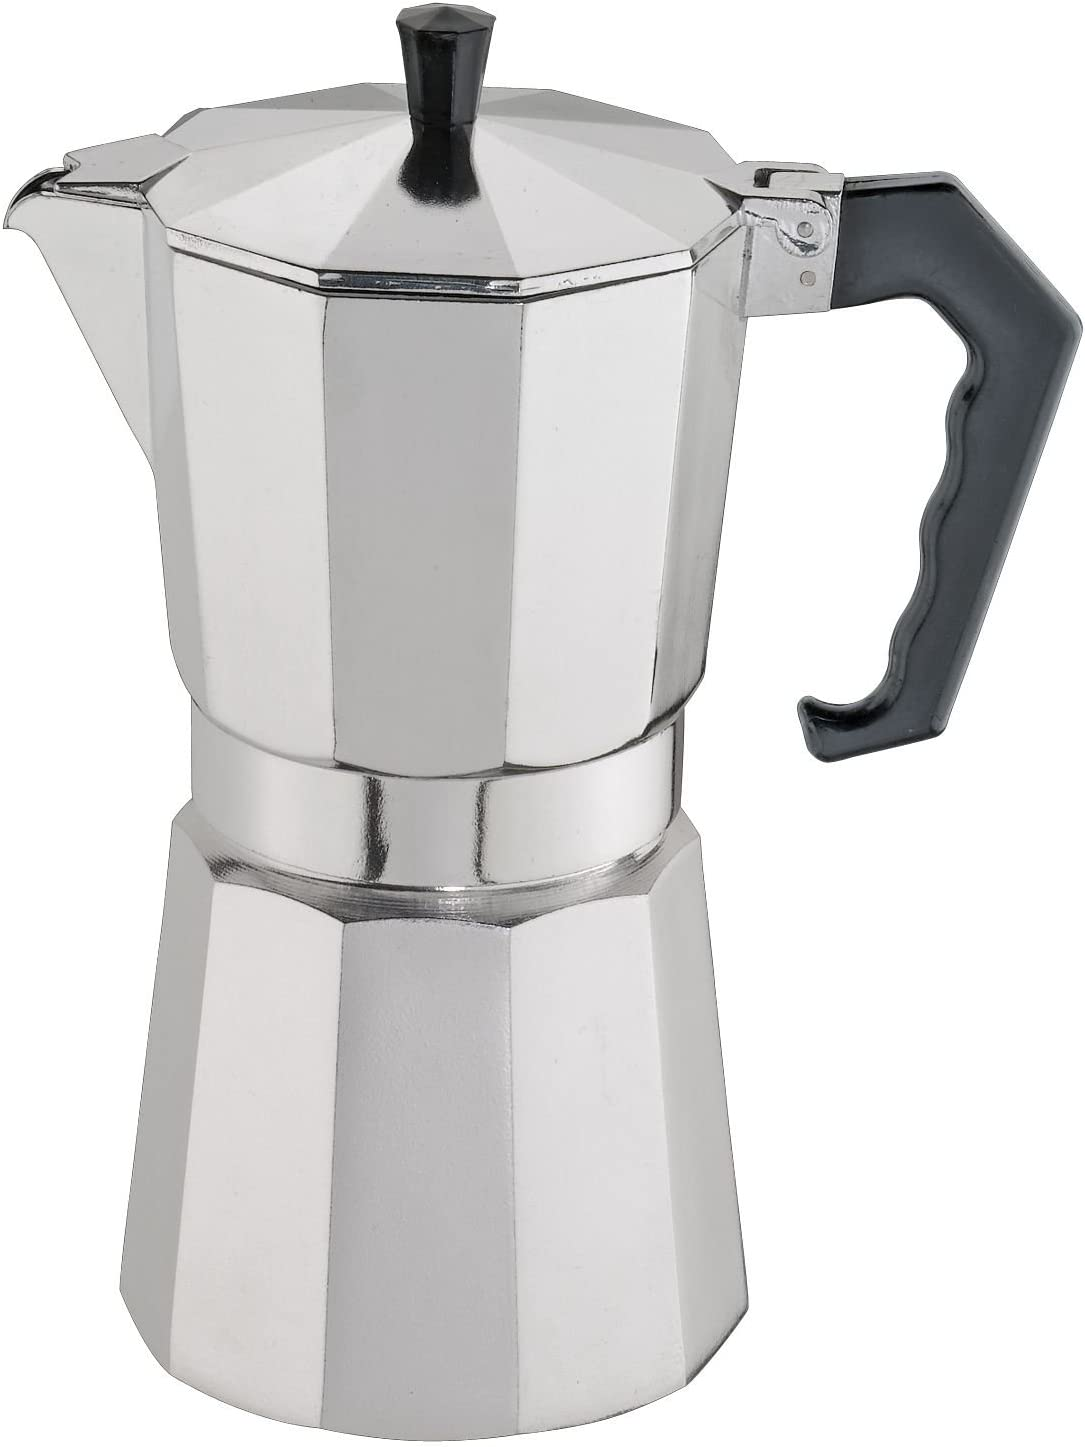 Cilio 321289 - Cafetera (Independiente, Cafetera turca, De café ...